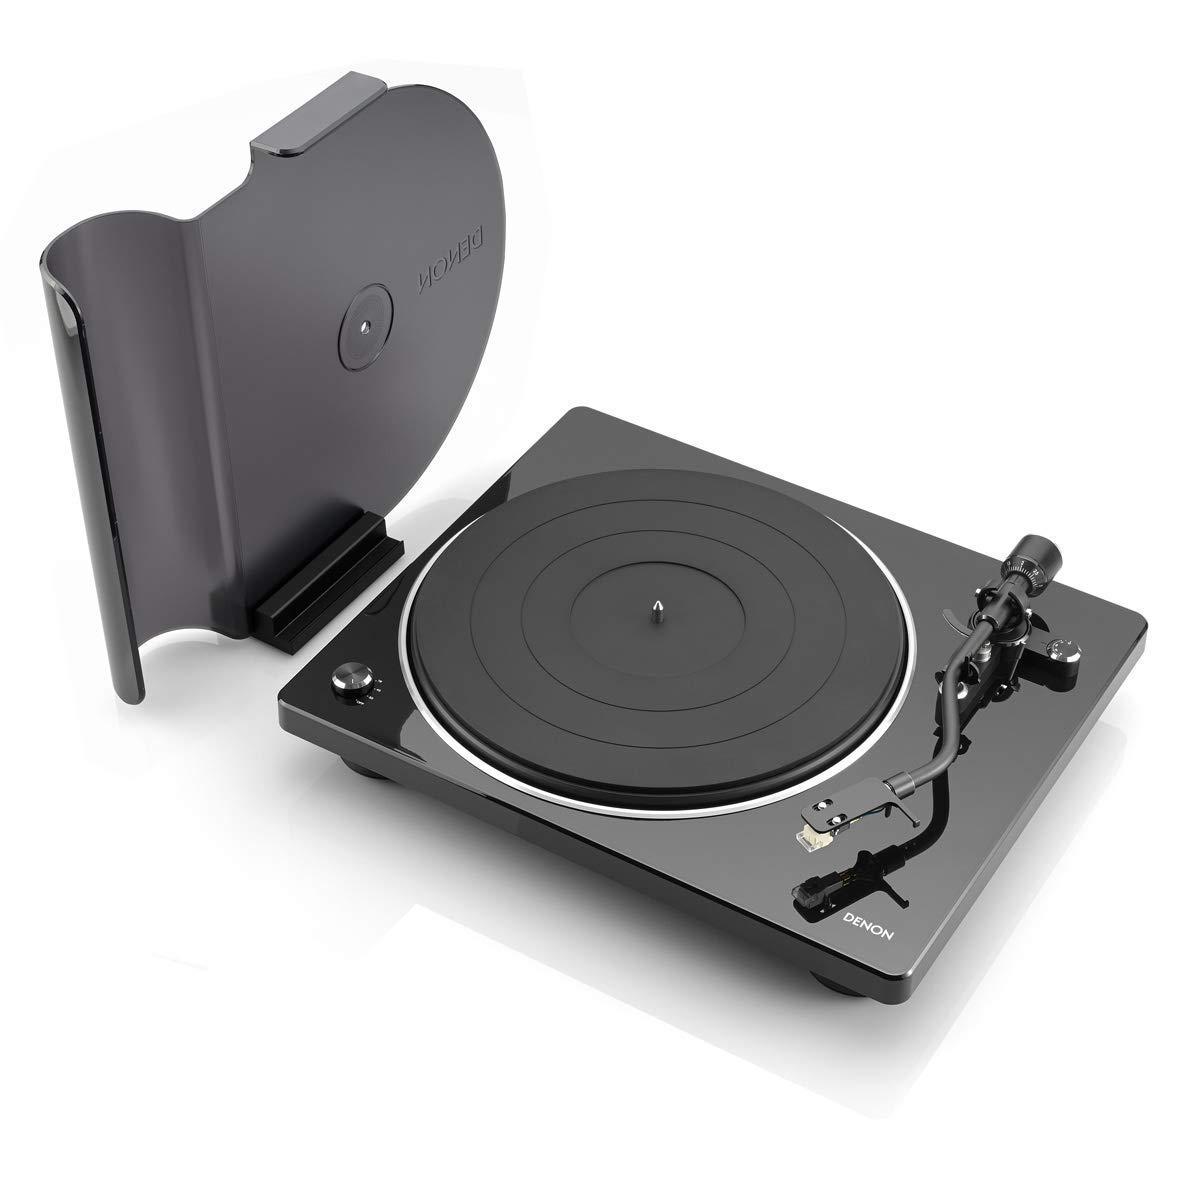 61FVI 9PrSL. SL1200 - 黑胶唱片机什么牌子好?5款最佳入门级唱片机推荐